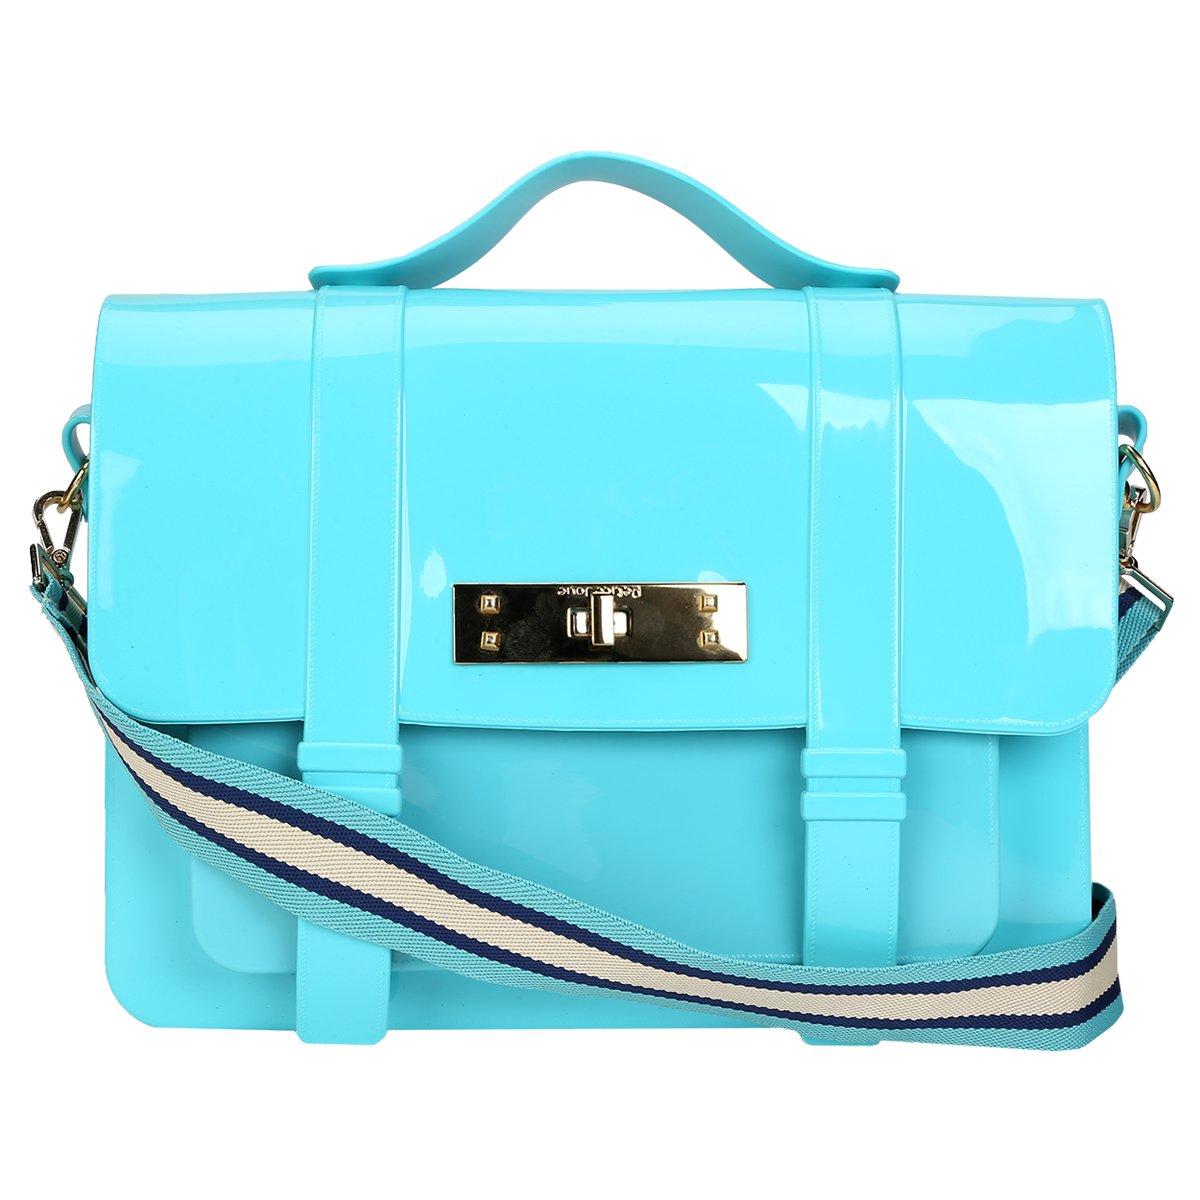 Bolsa petite jolie satchel azul piscina for Bolsa piscina